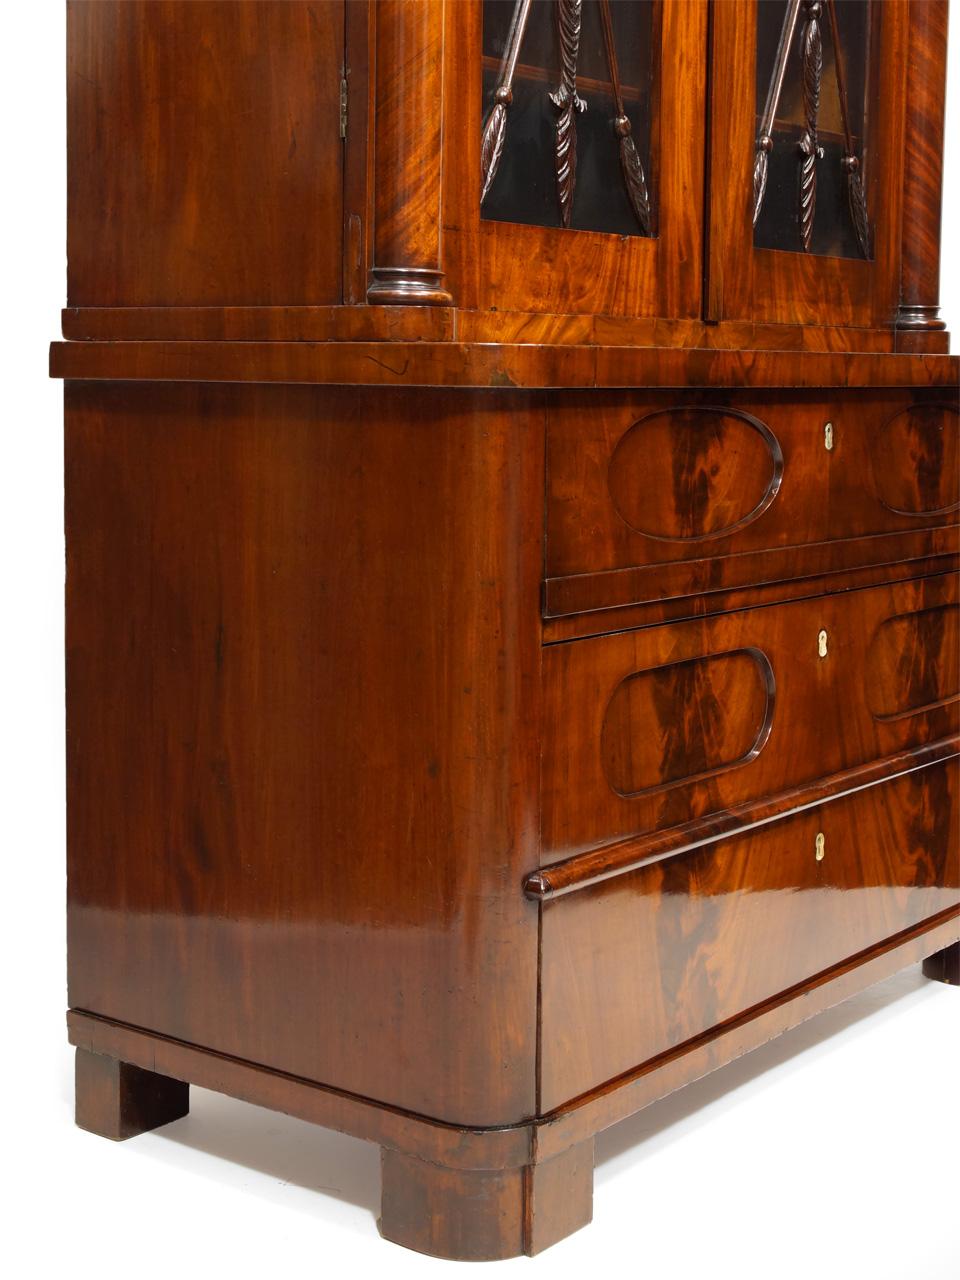 bibliothek schrank stunning fabulous wohnzimmer regal. Black Bedroom Furniture Sets. Home Design Ideas